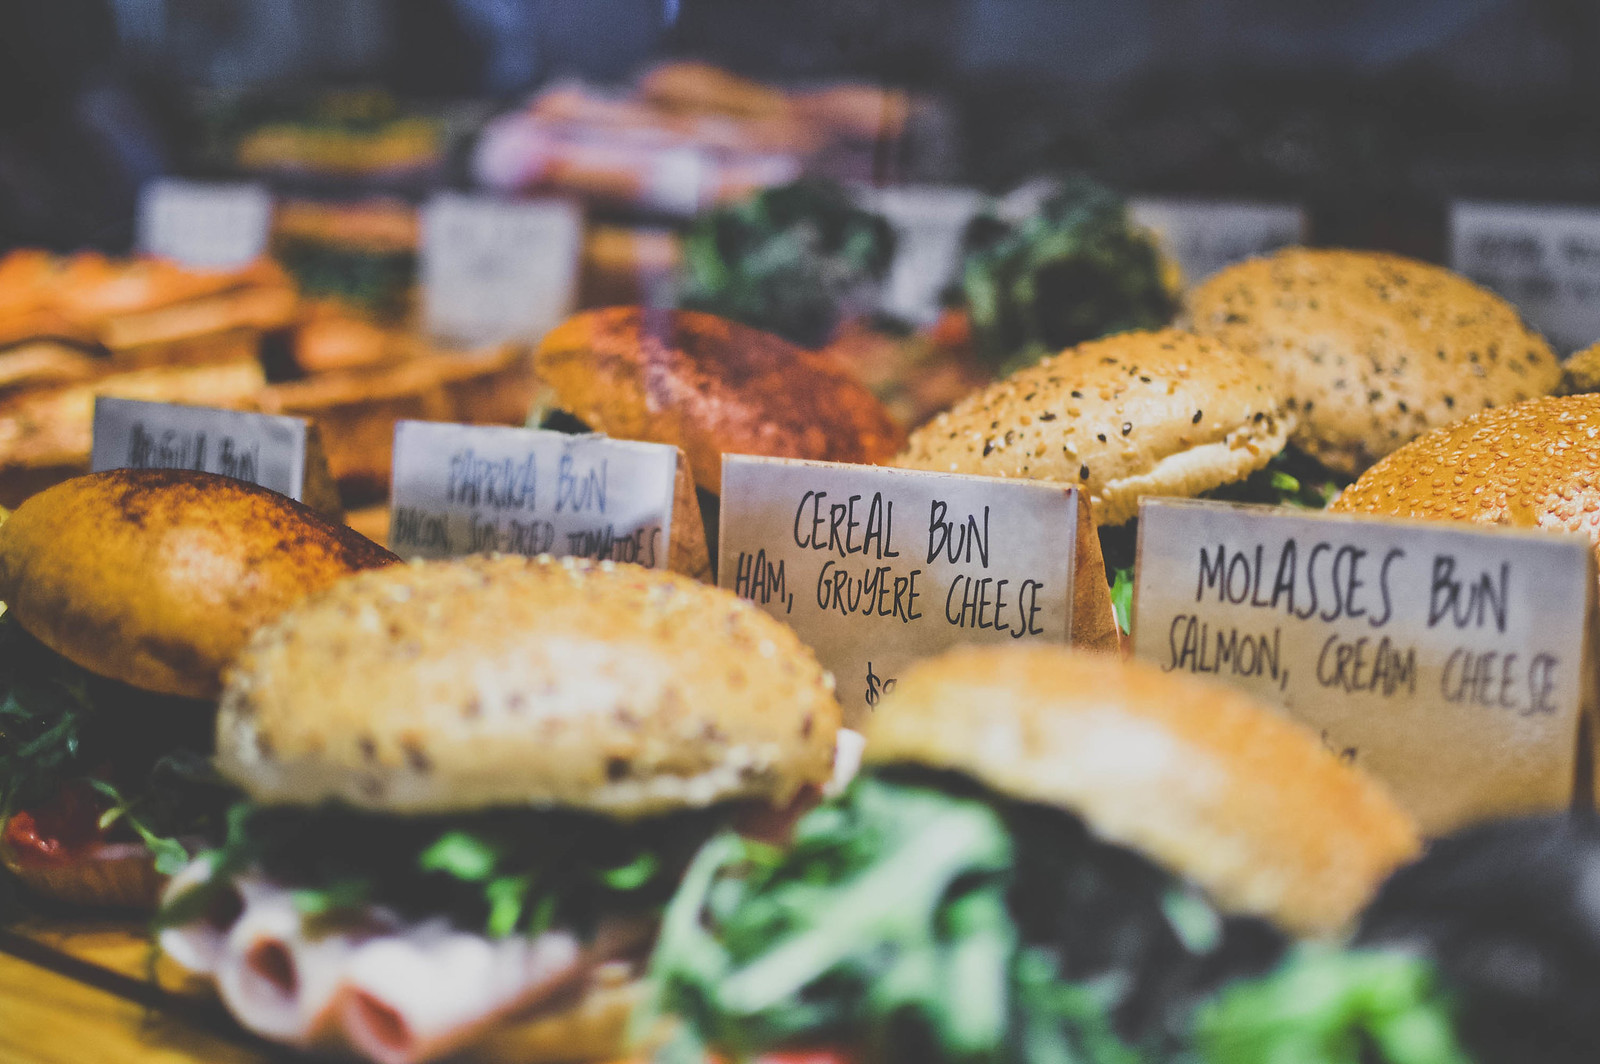 Tiong Bahru Bakery by Gontran Cherrier